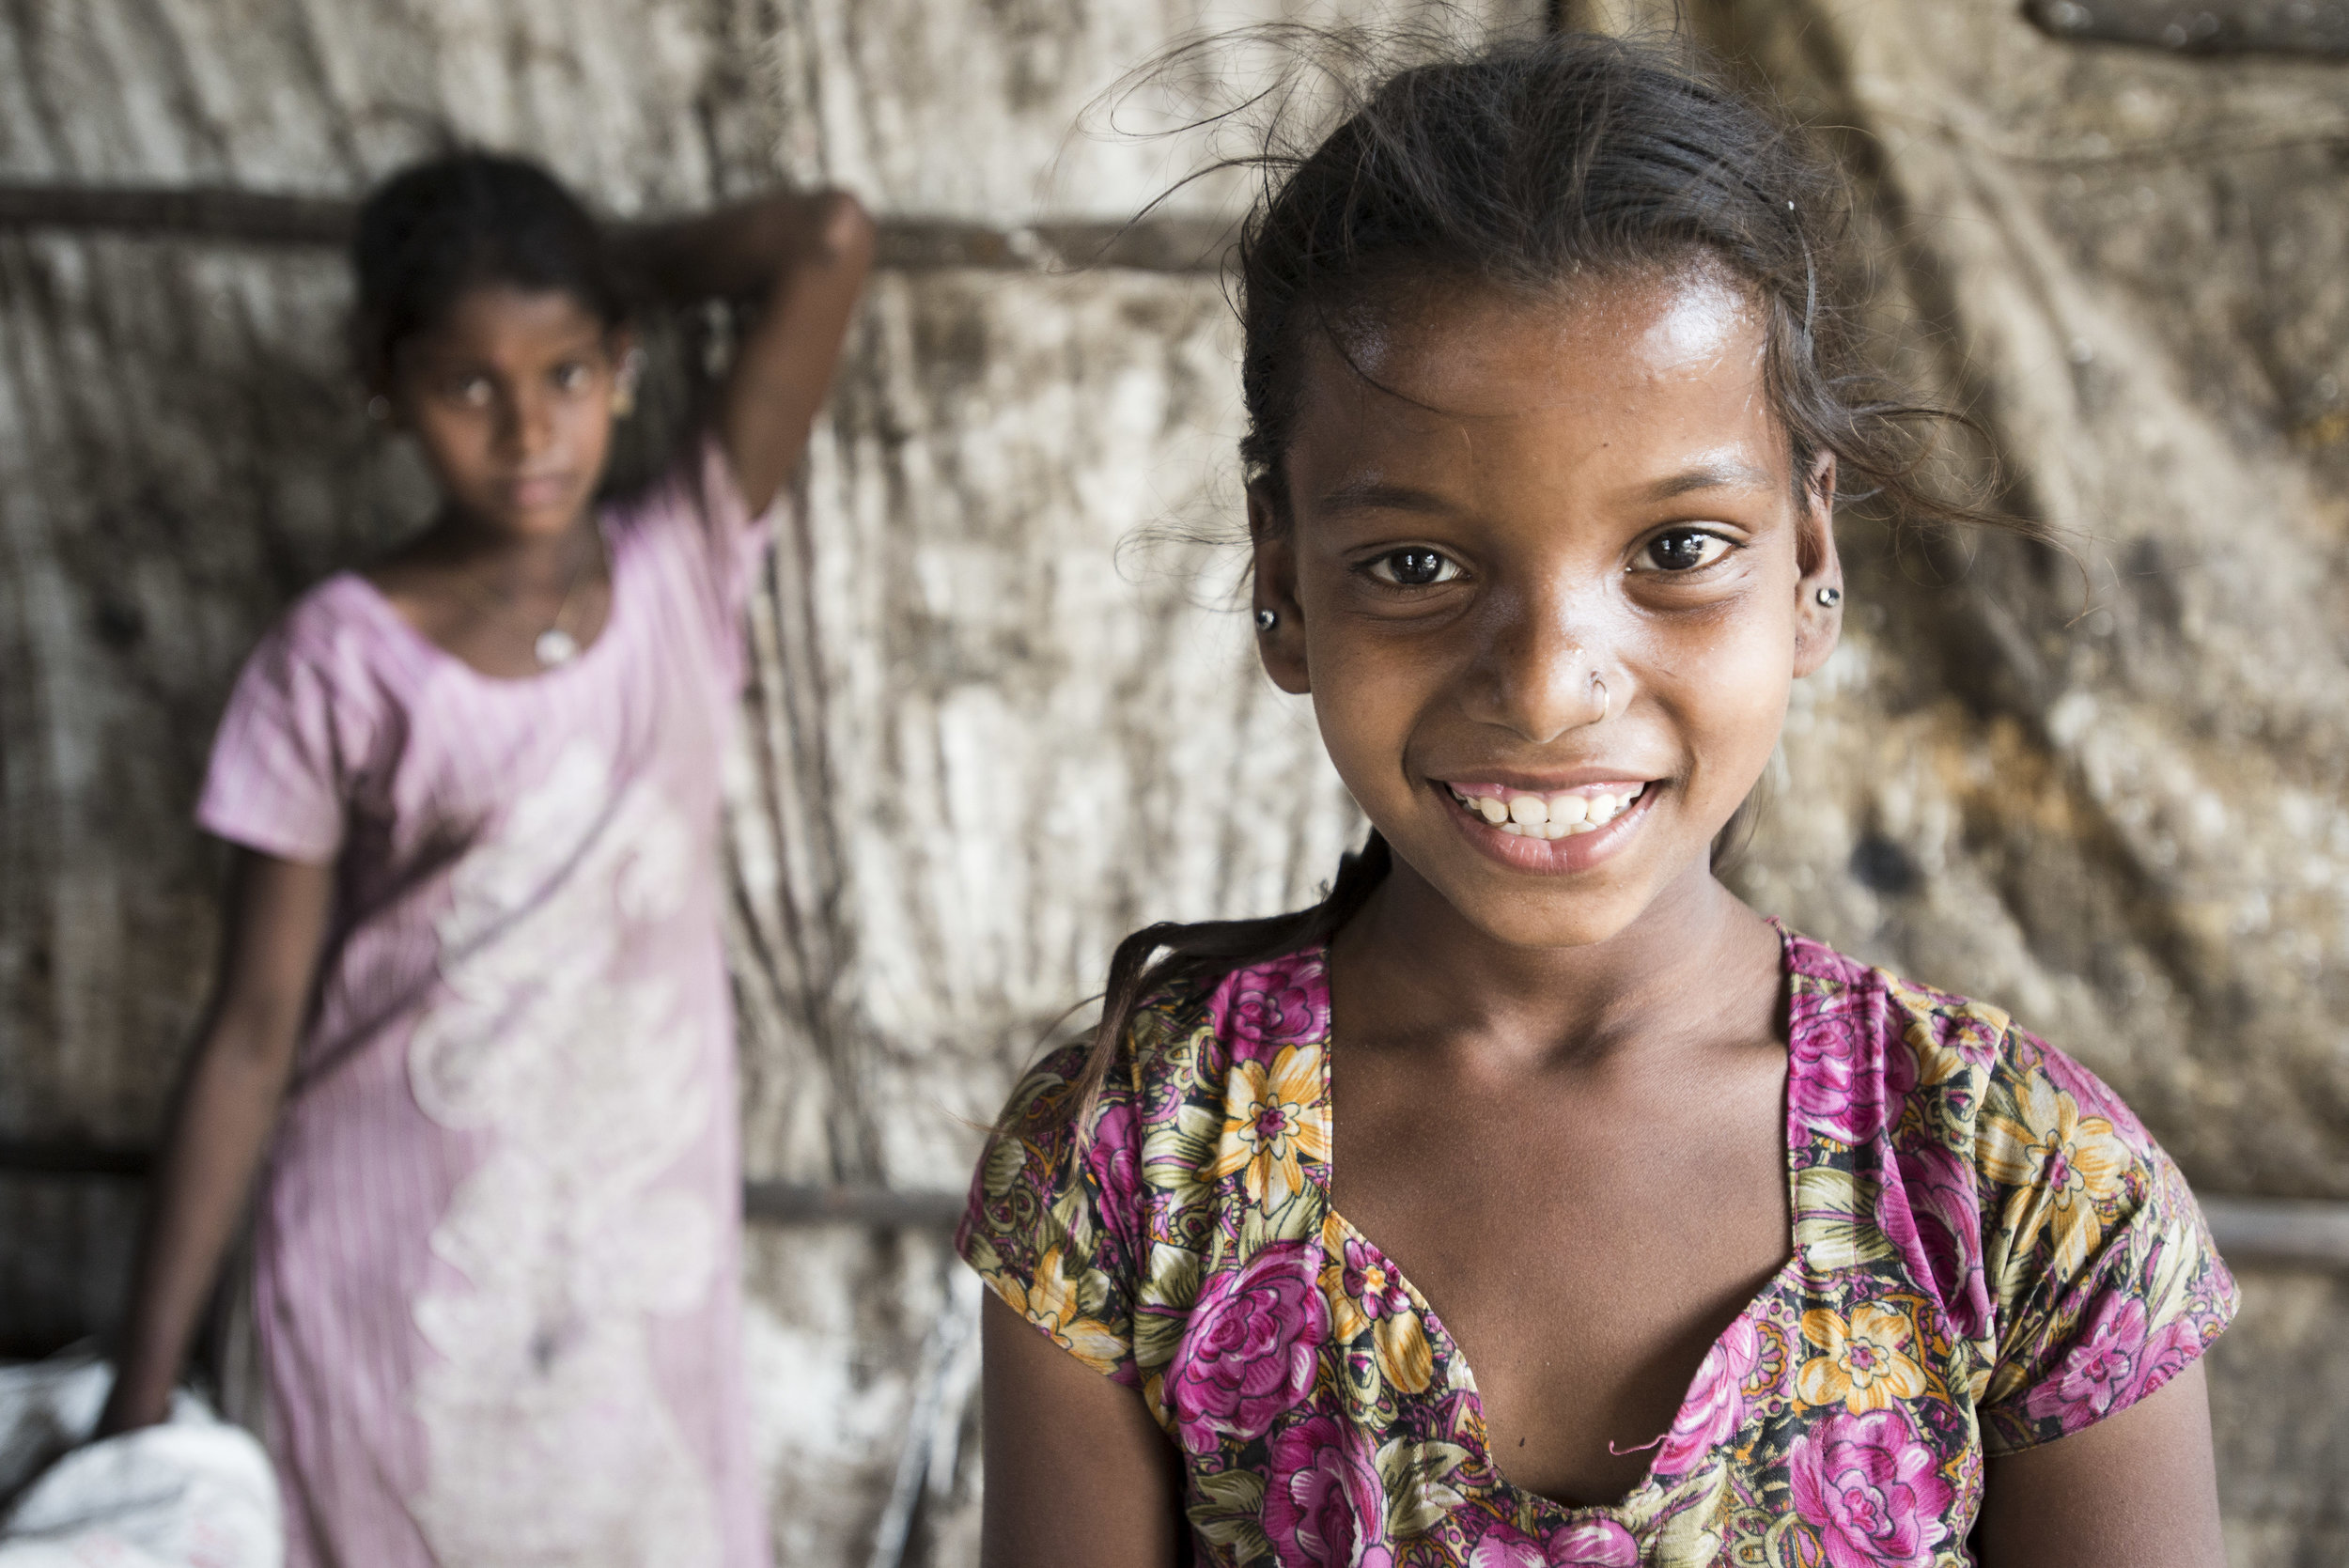 Child labour project. Kolkata, India. 2015.